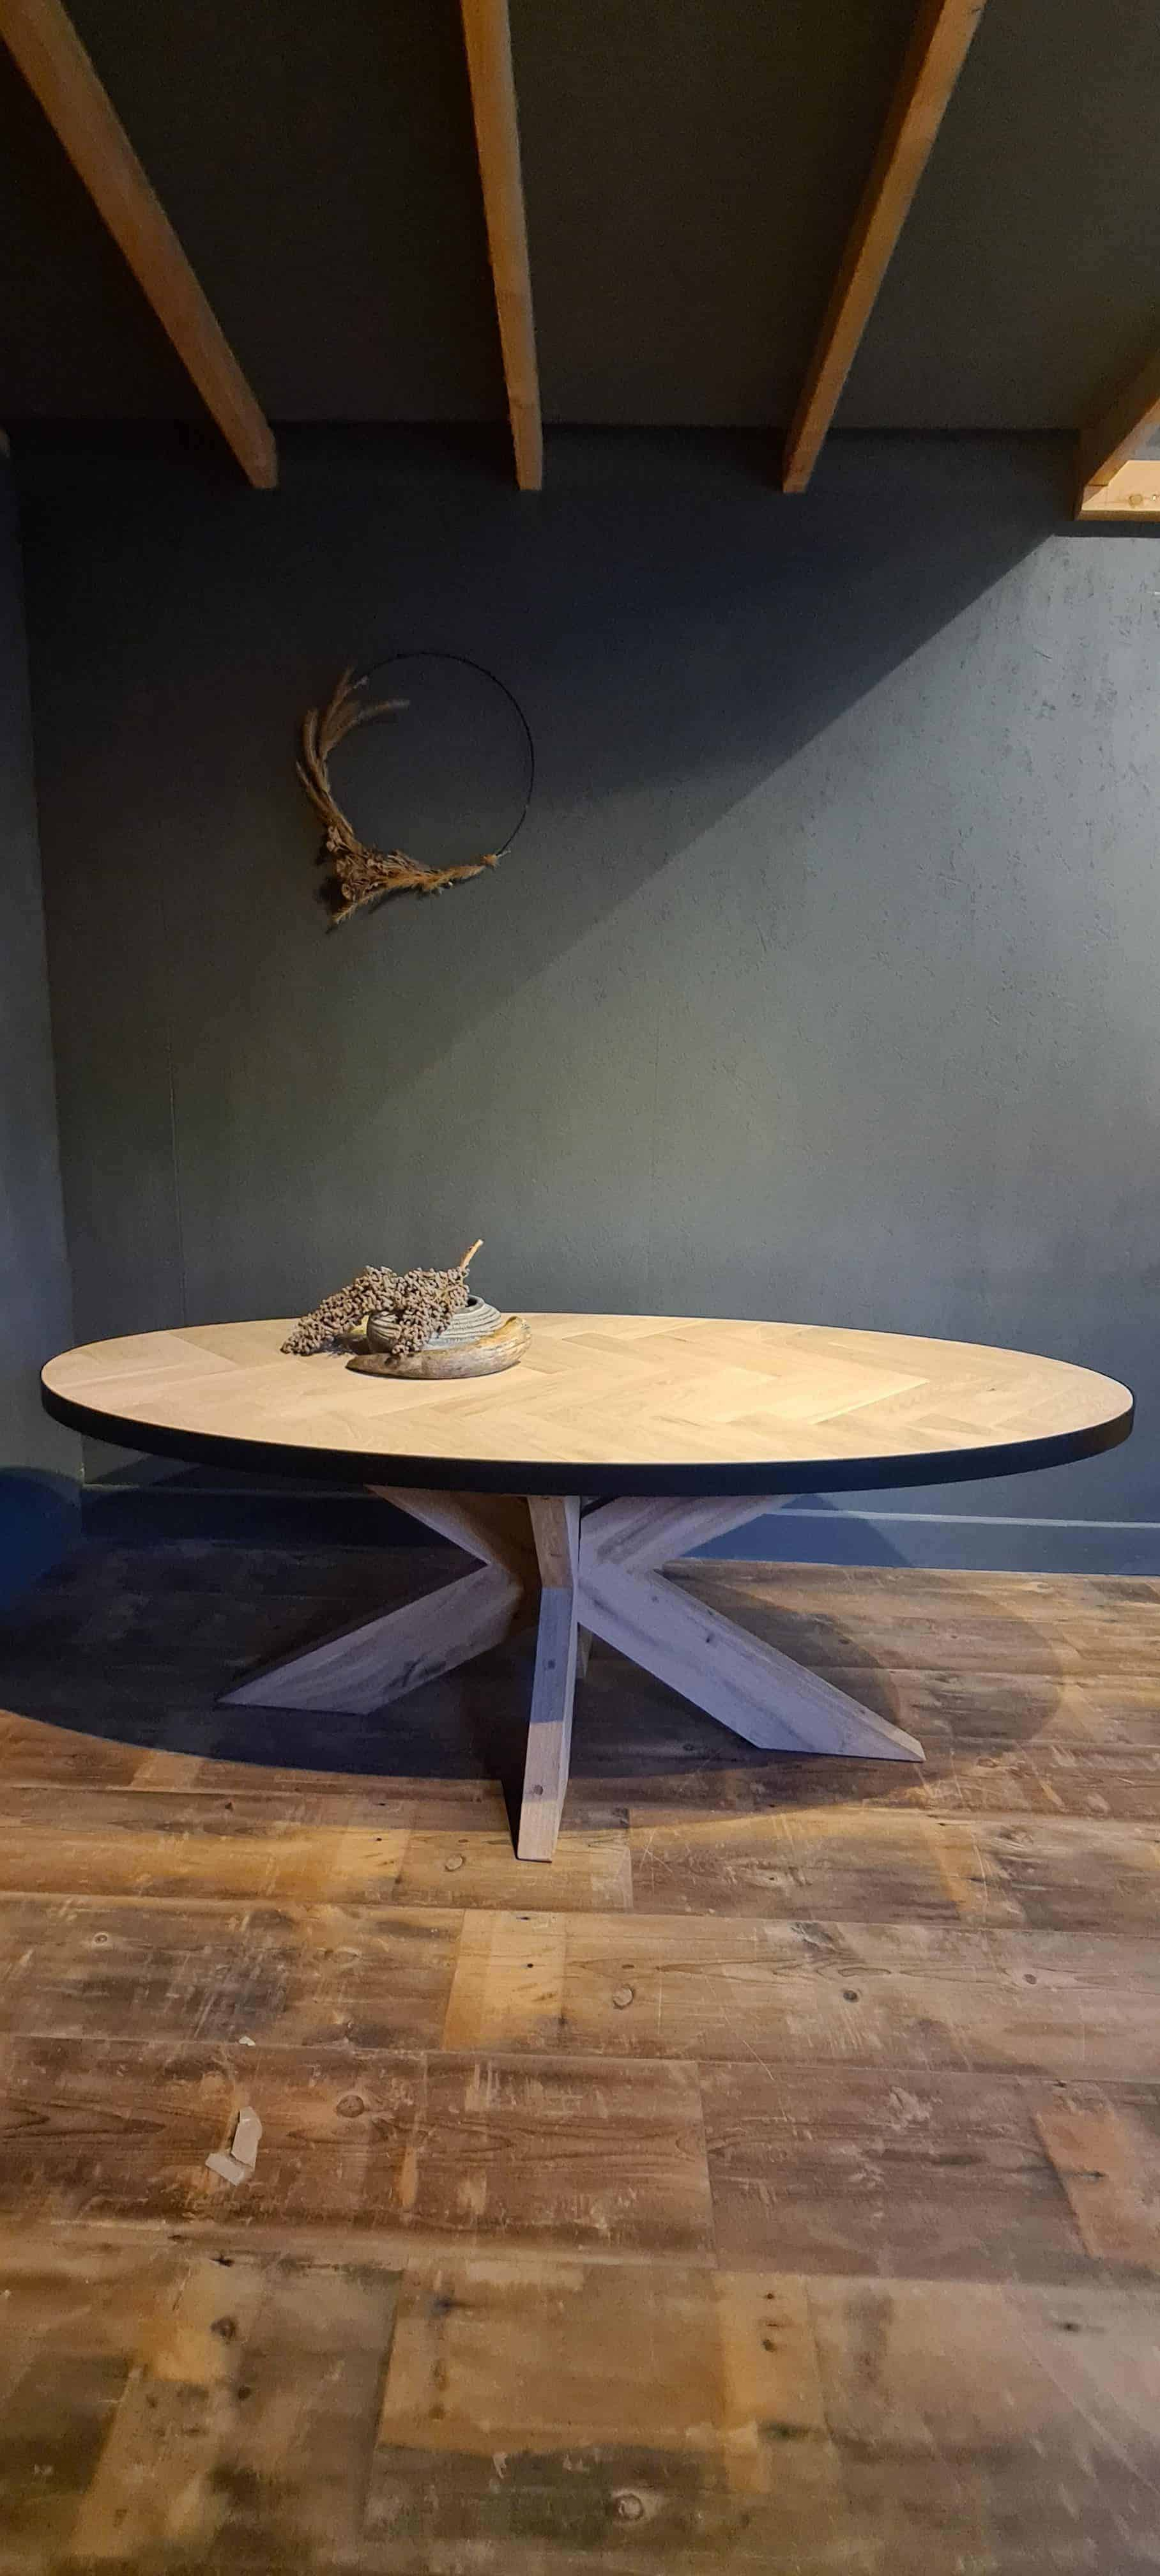 Ovale visgraat tafel met stalen rand.